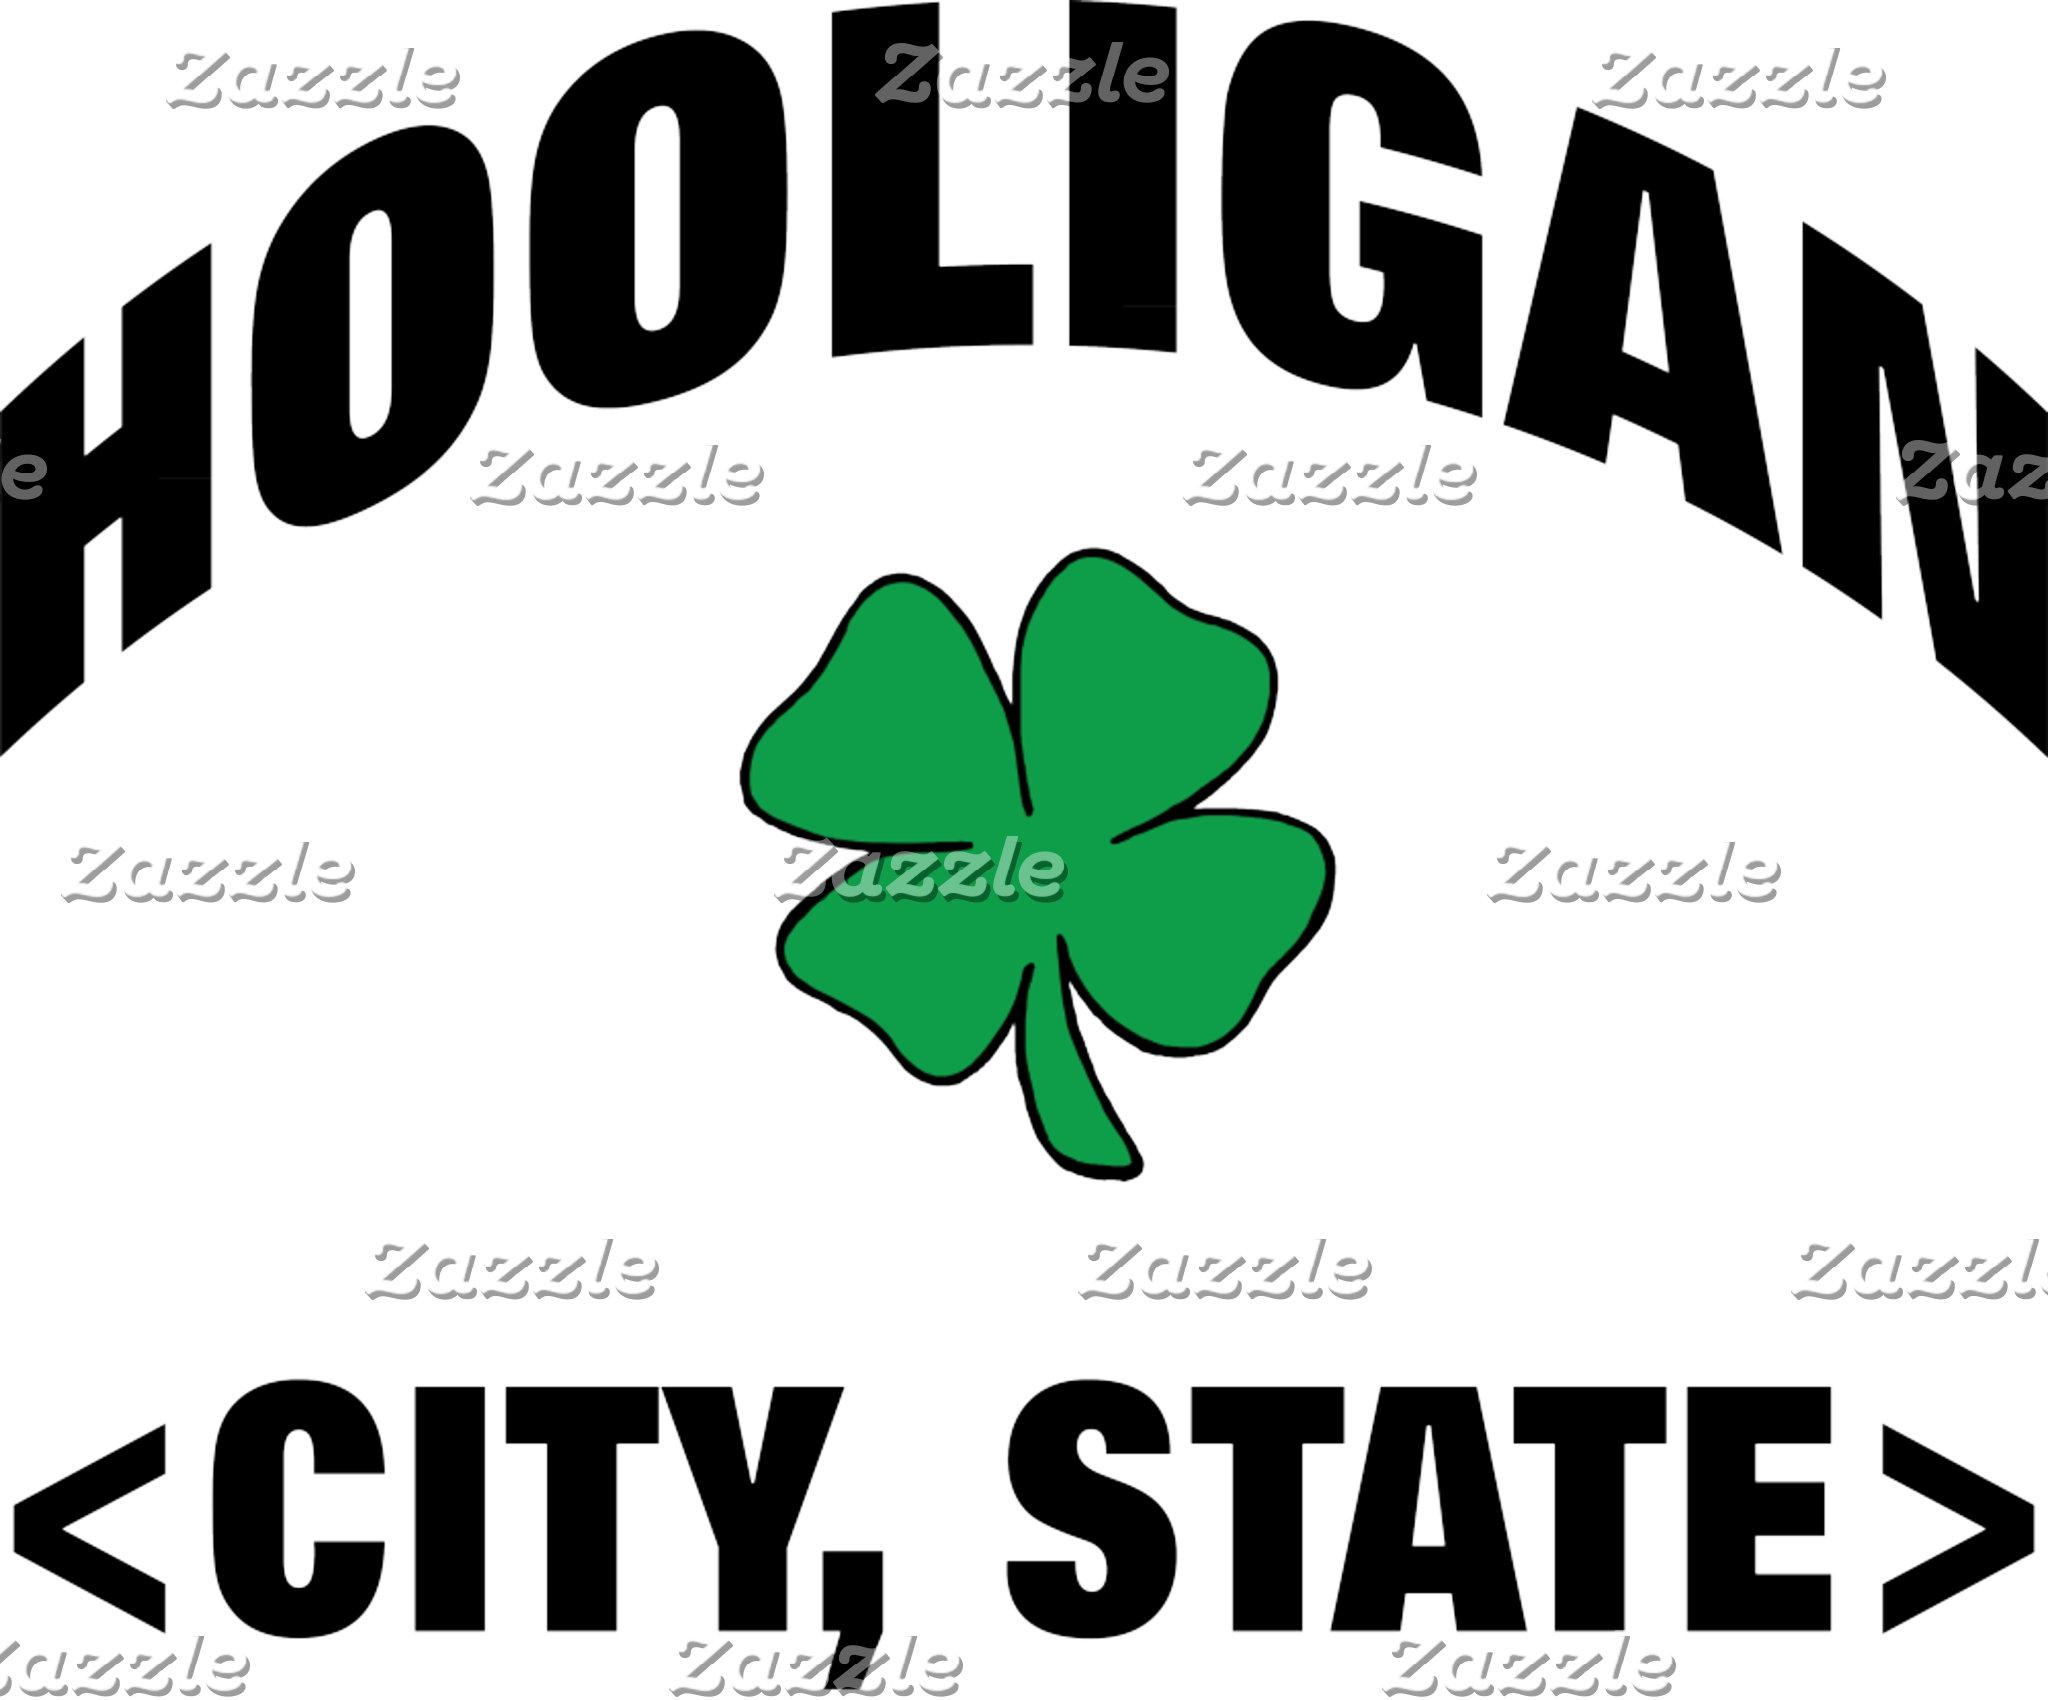 A Personalized Irish Hooligan T-Shirt or Gift